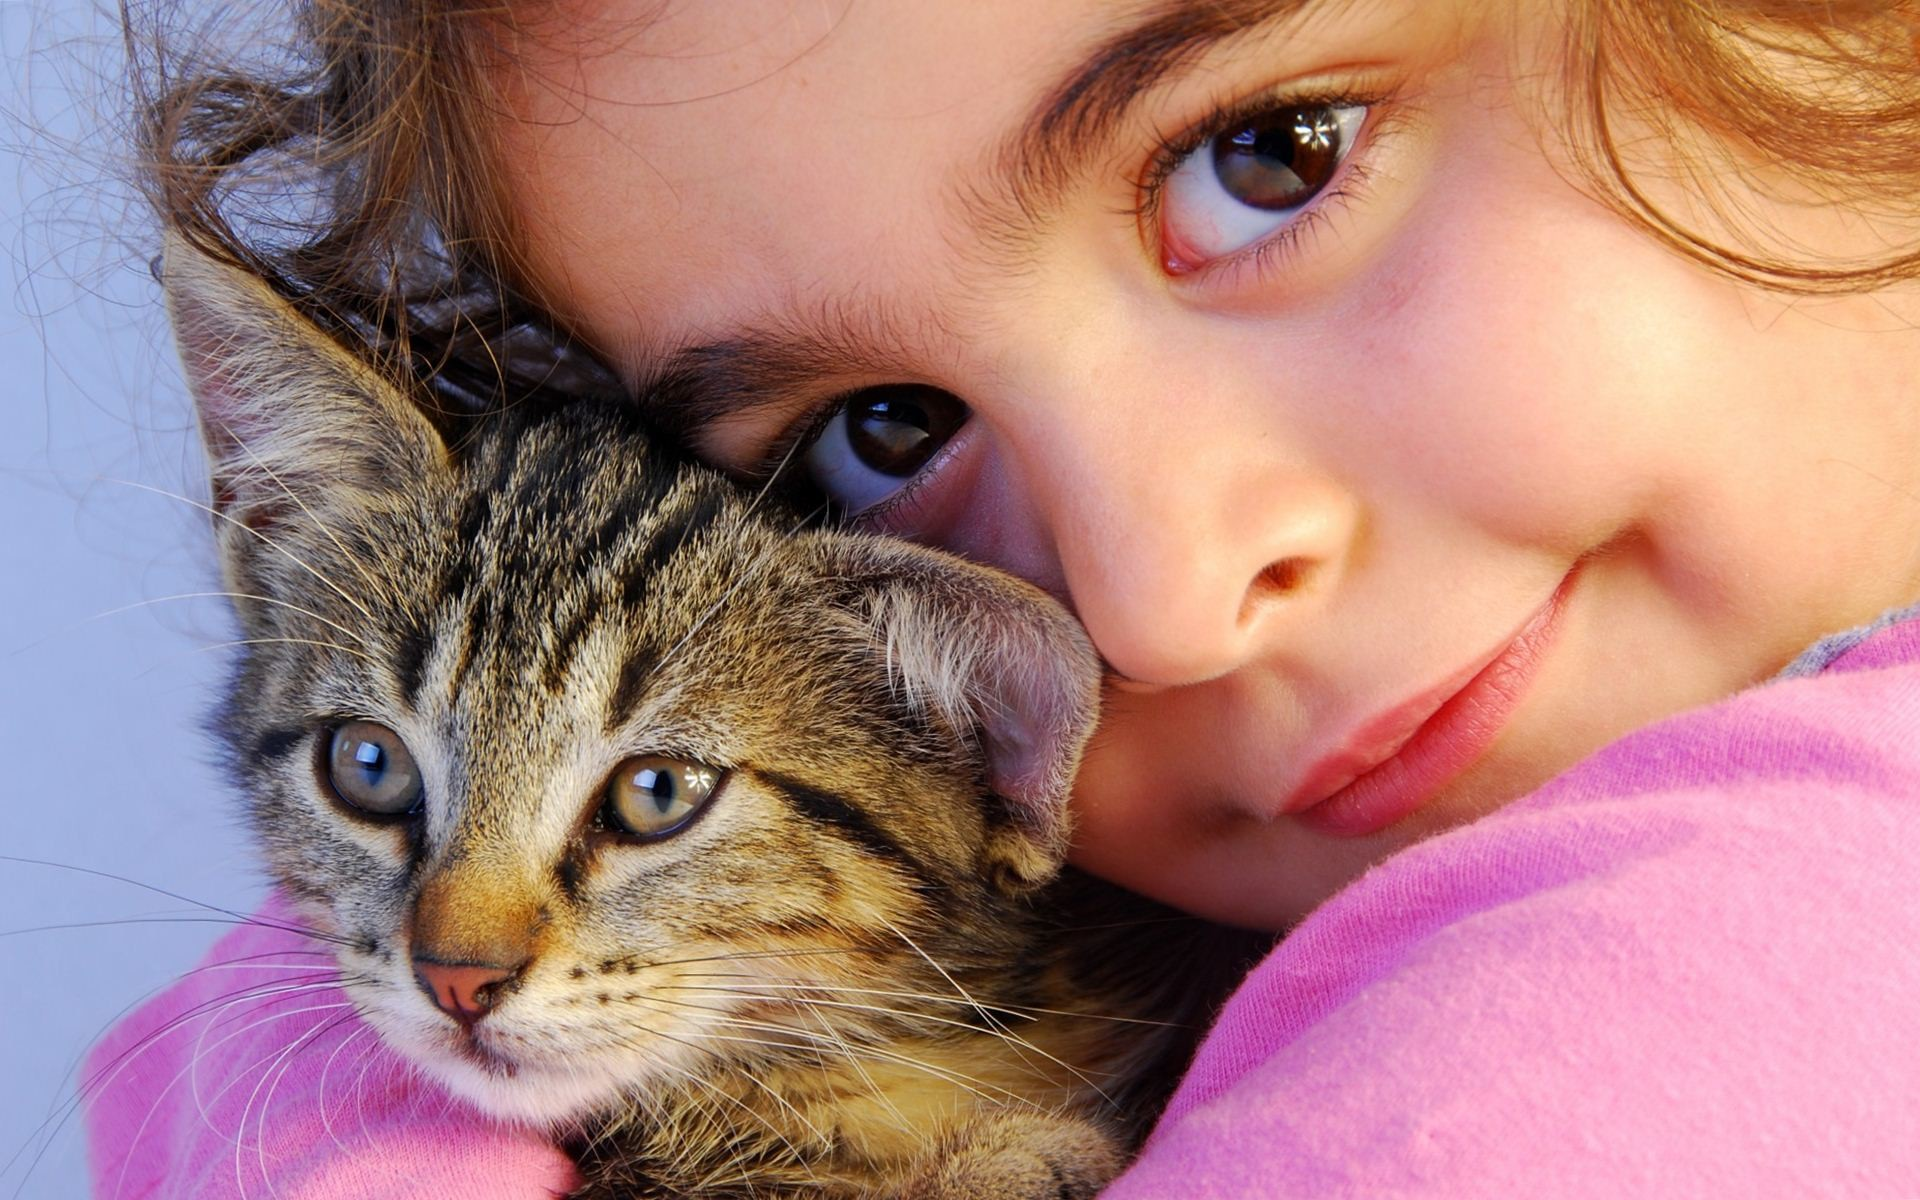 17 Best ideas about Cute Baby Photos Hd on Pinterest | Heart .